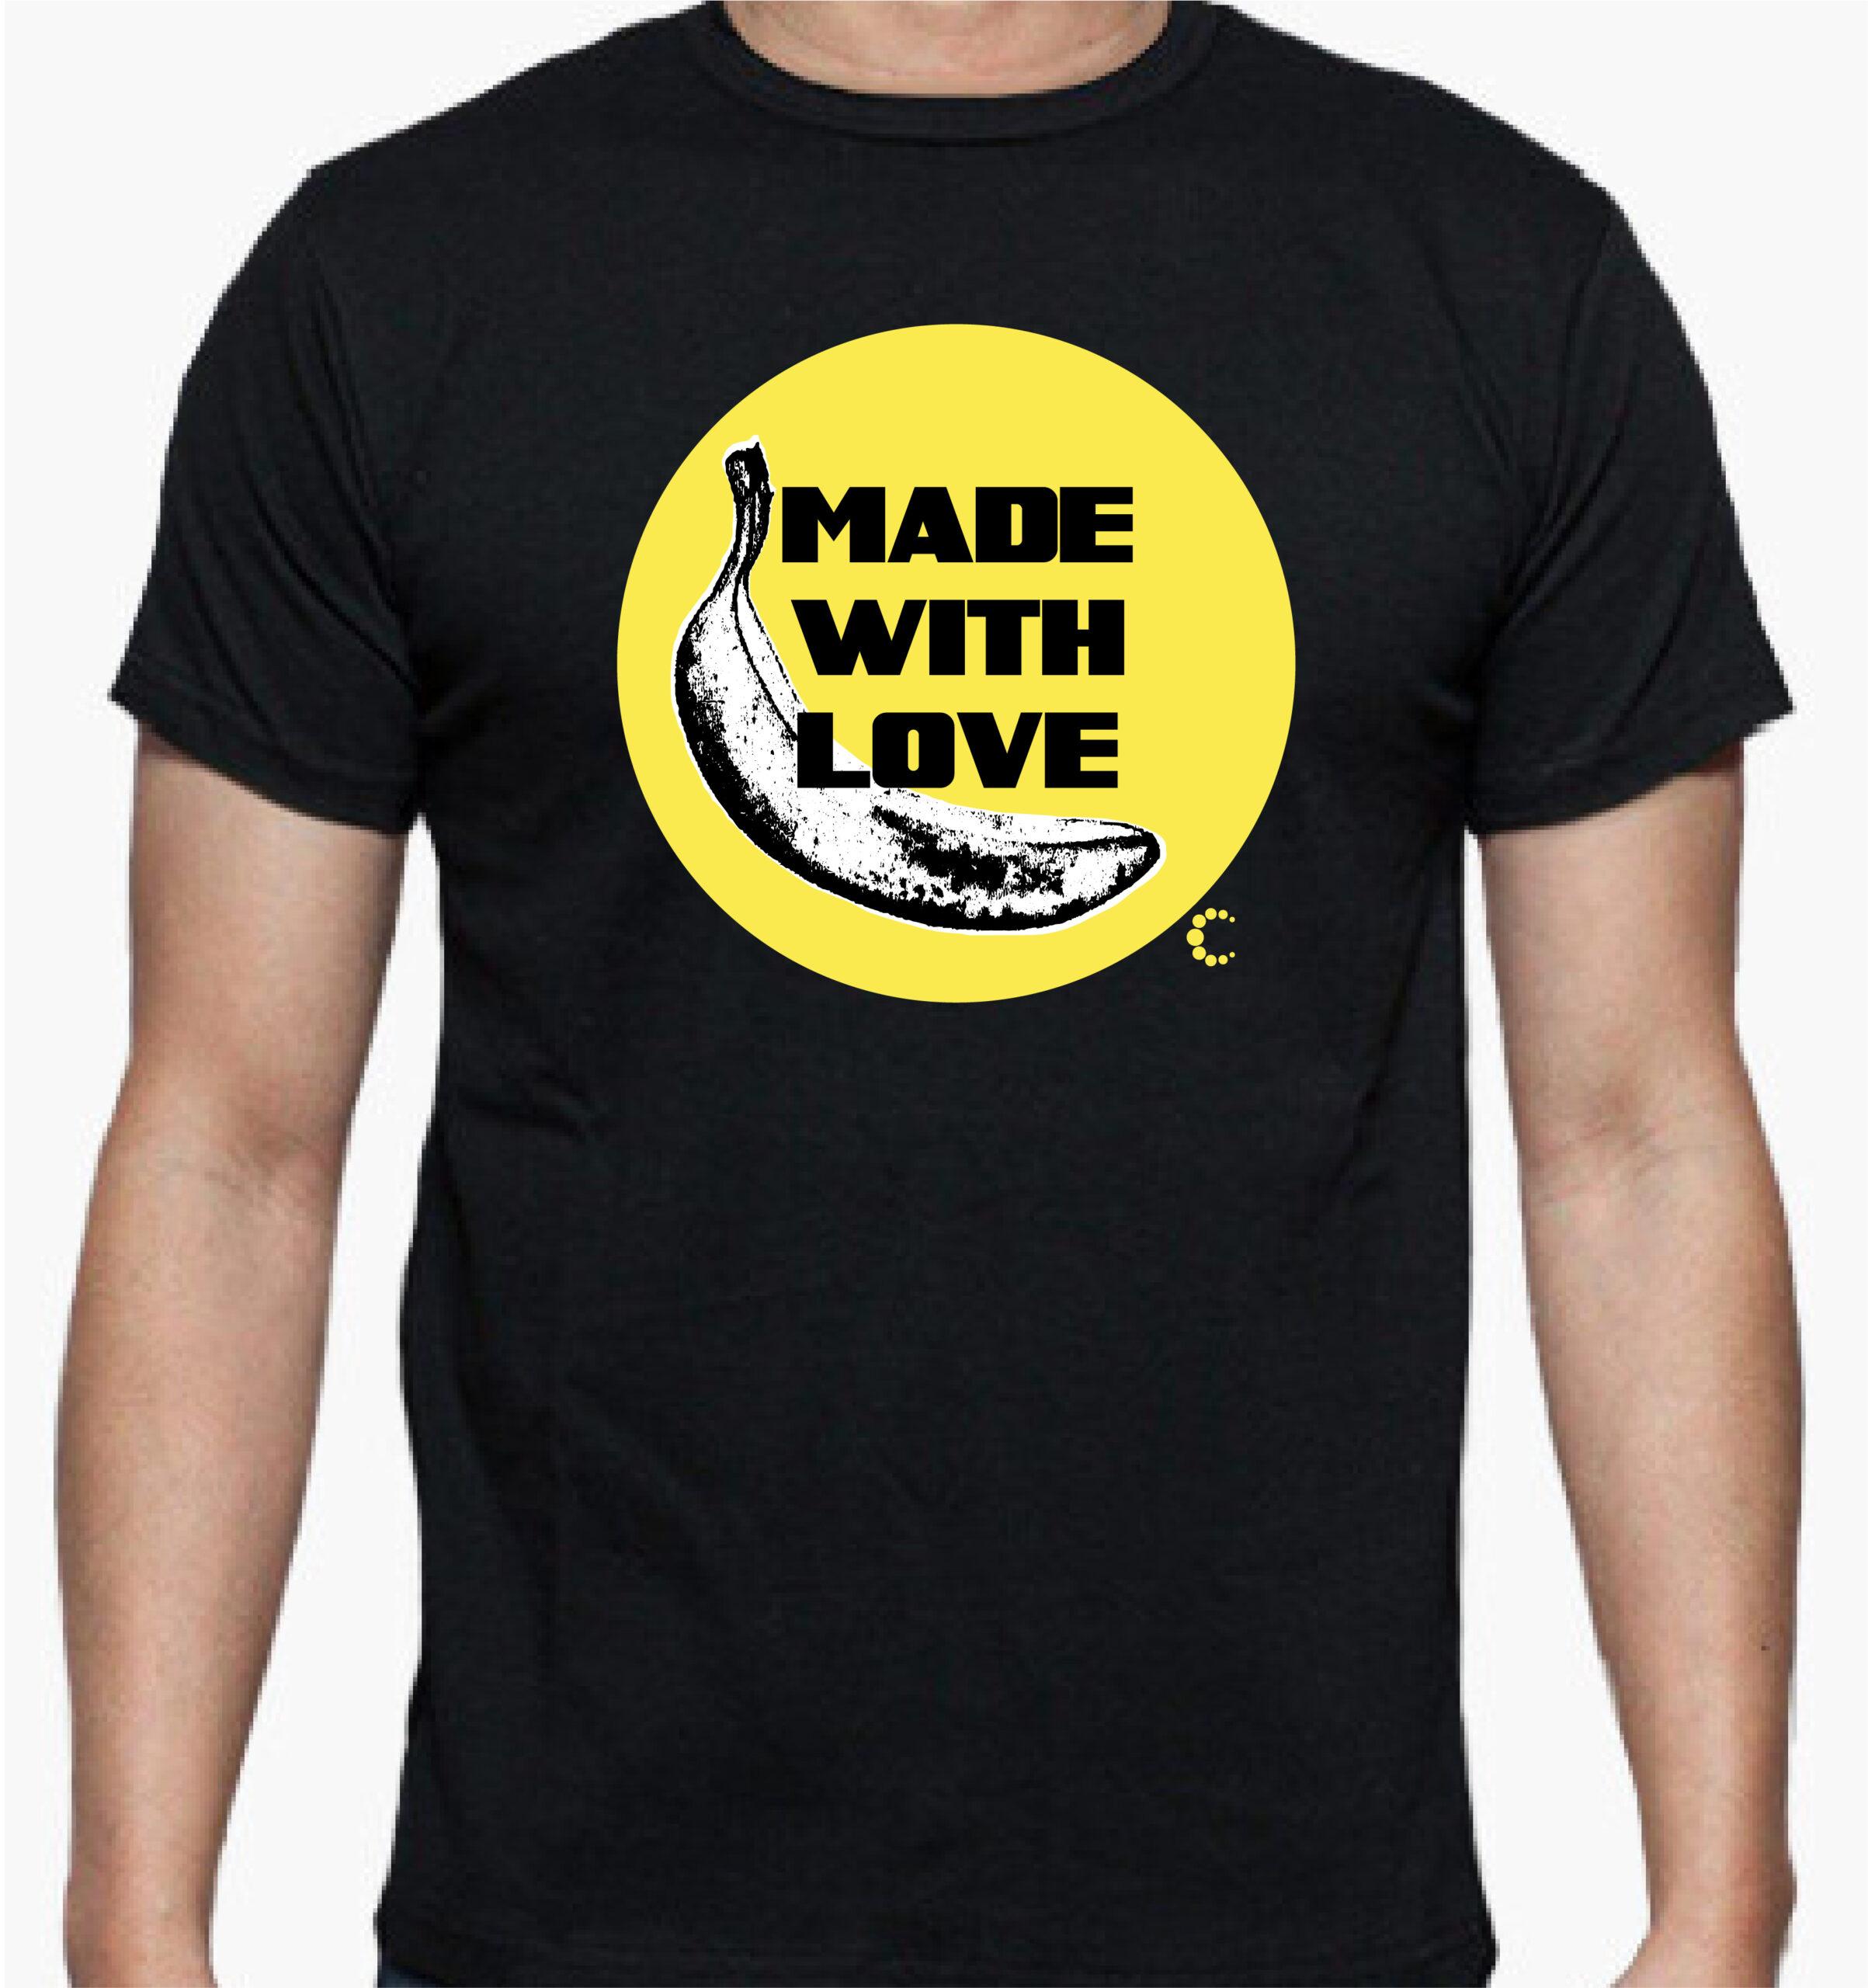 camiseta made with love negra amarilla algodon